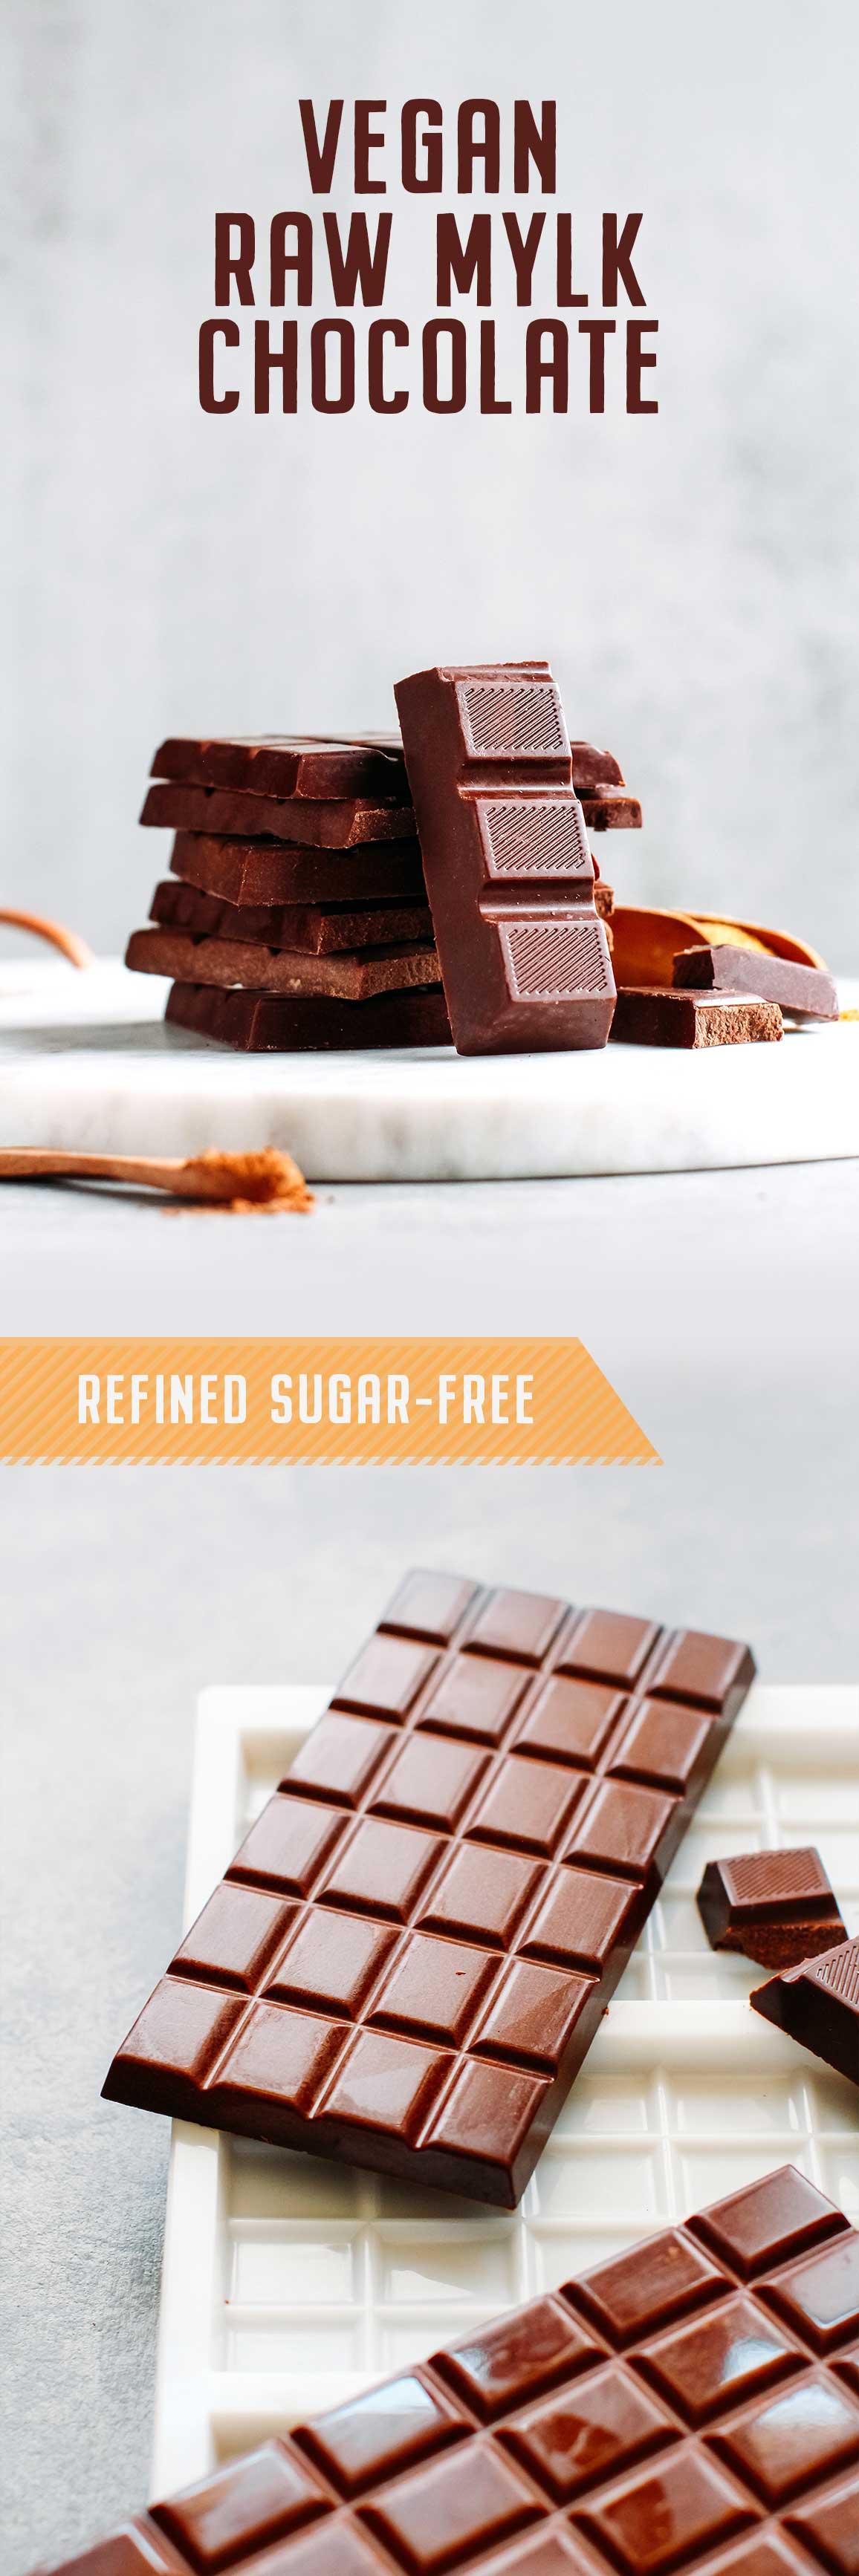 Vegan Raw Mylk Chocolate